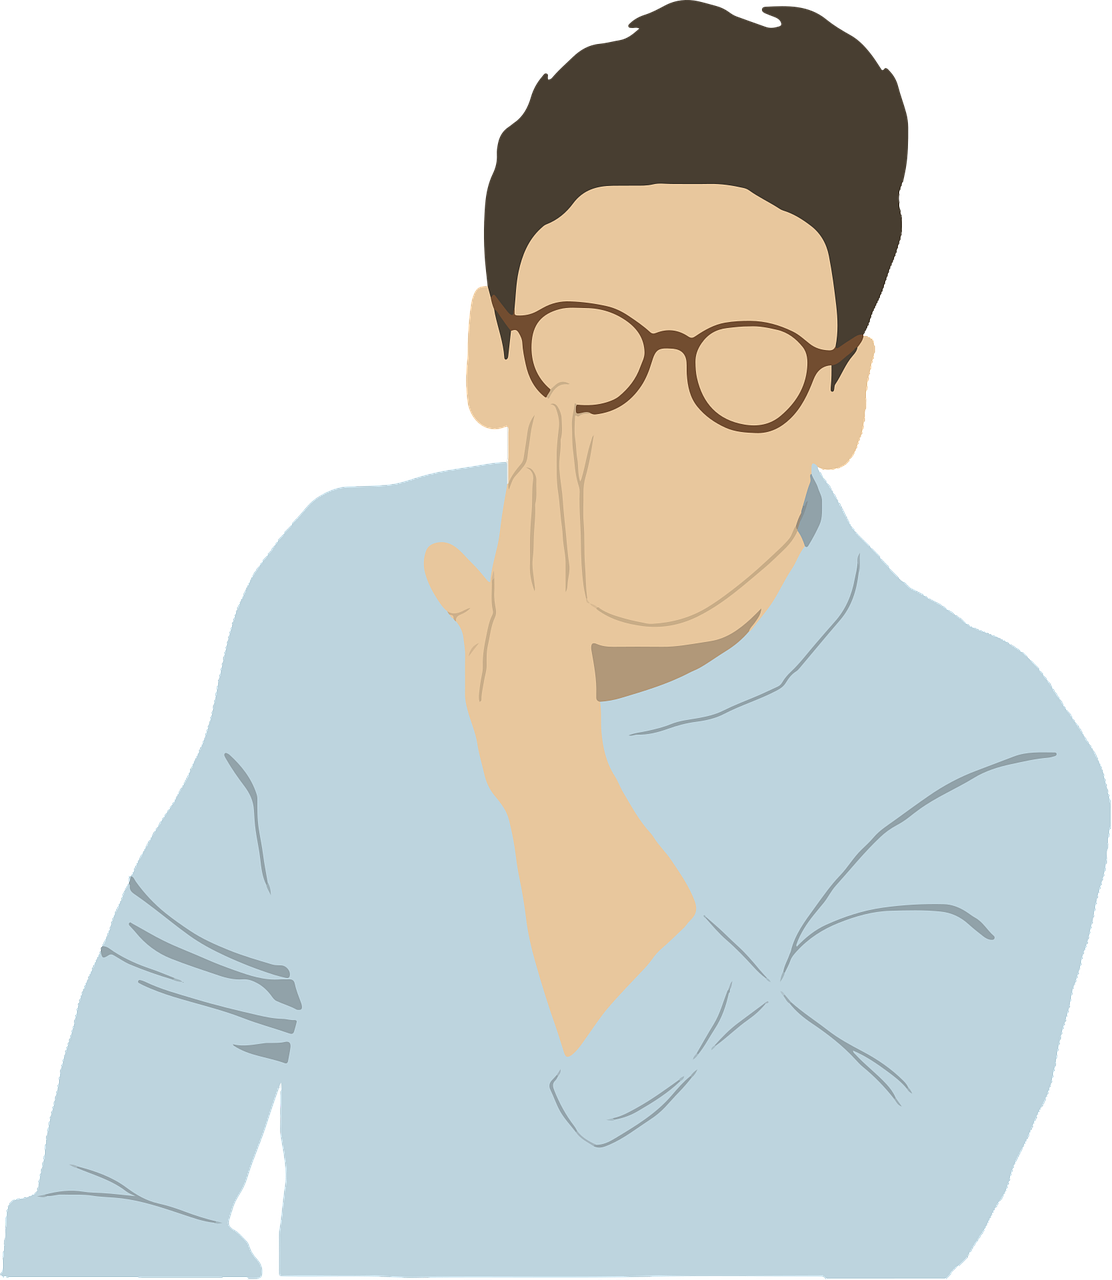 A secret for effective gestures in public speaking.